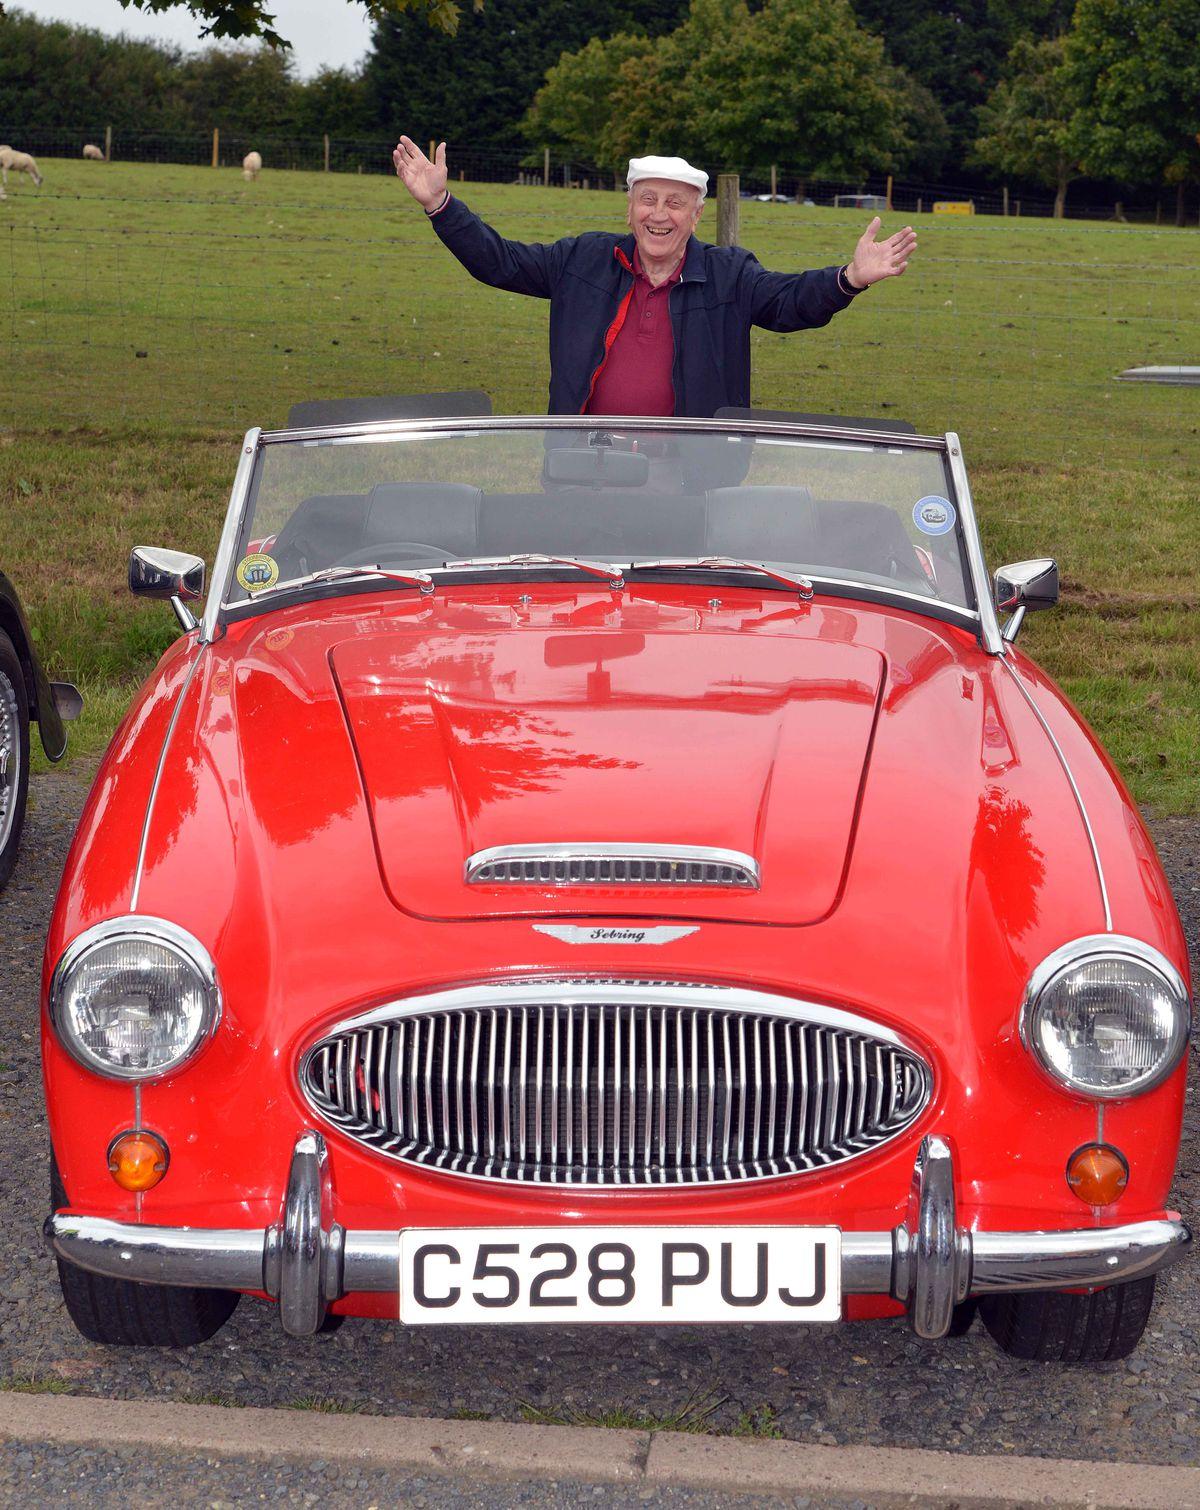 Arthur Wood in his replica Austin Healey 300 sports car